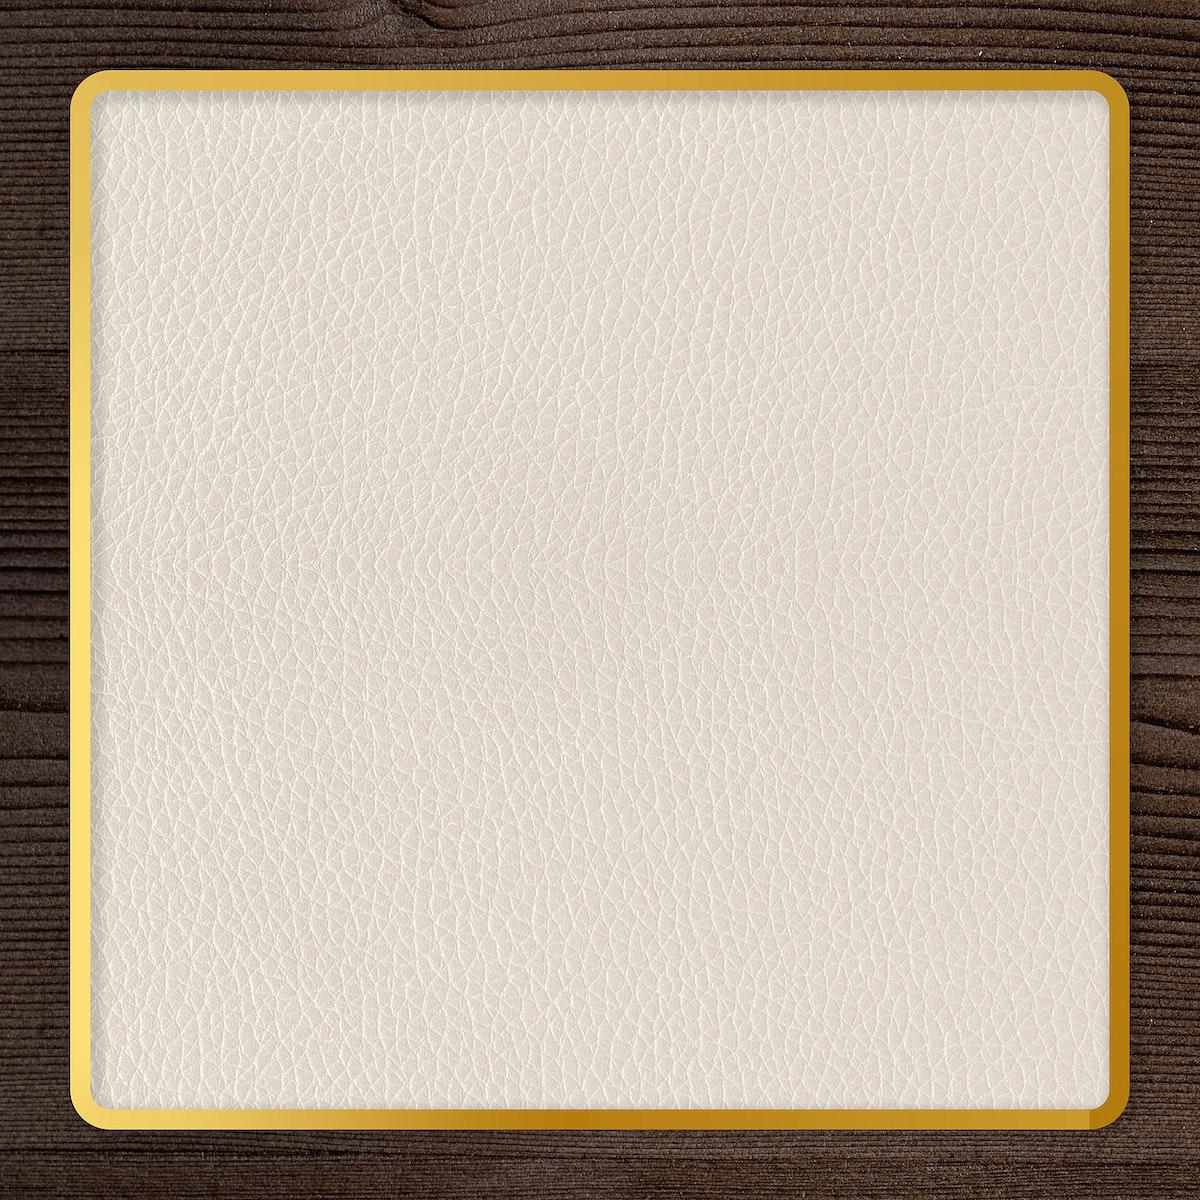 Gold frame on beige leather background template illustration